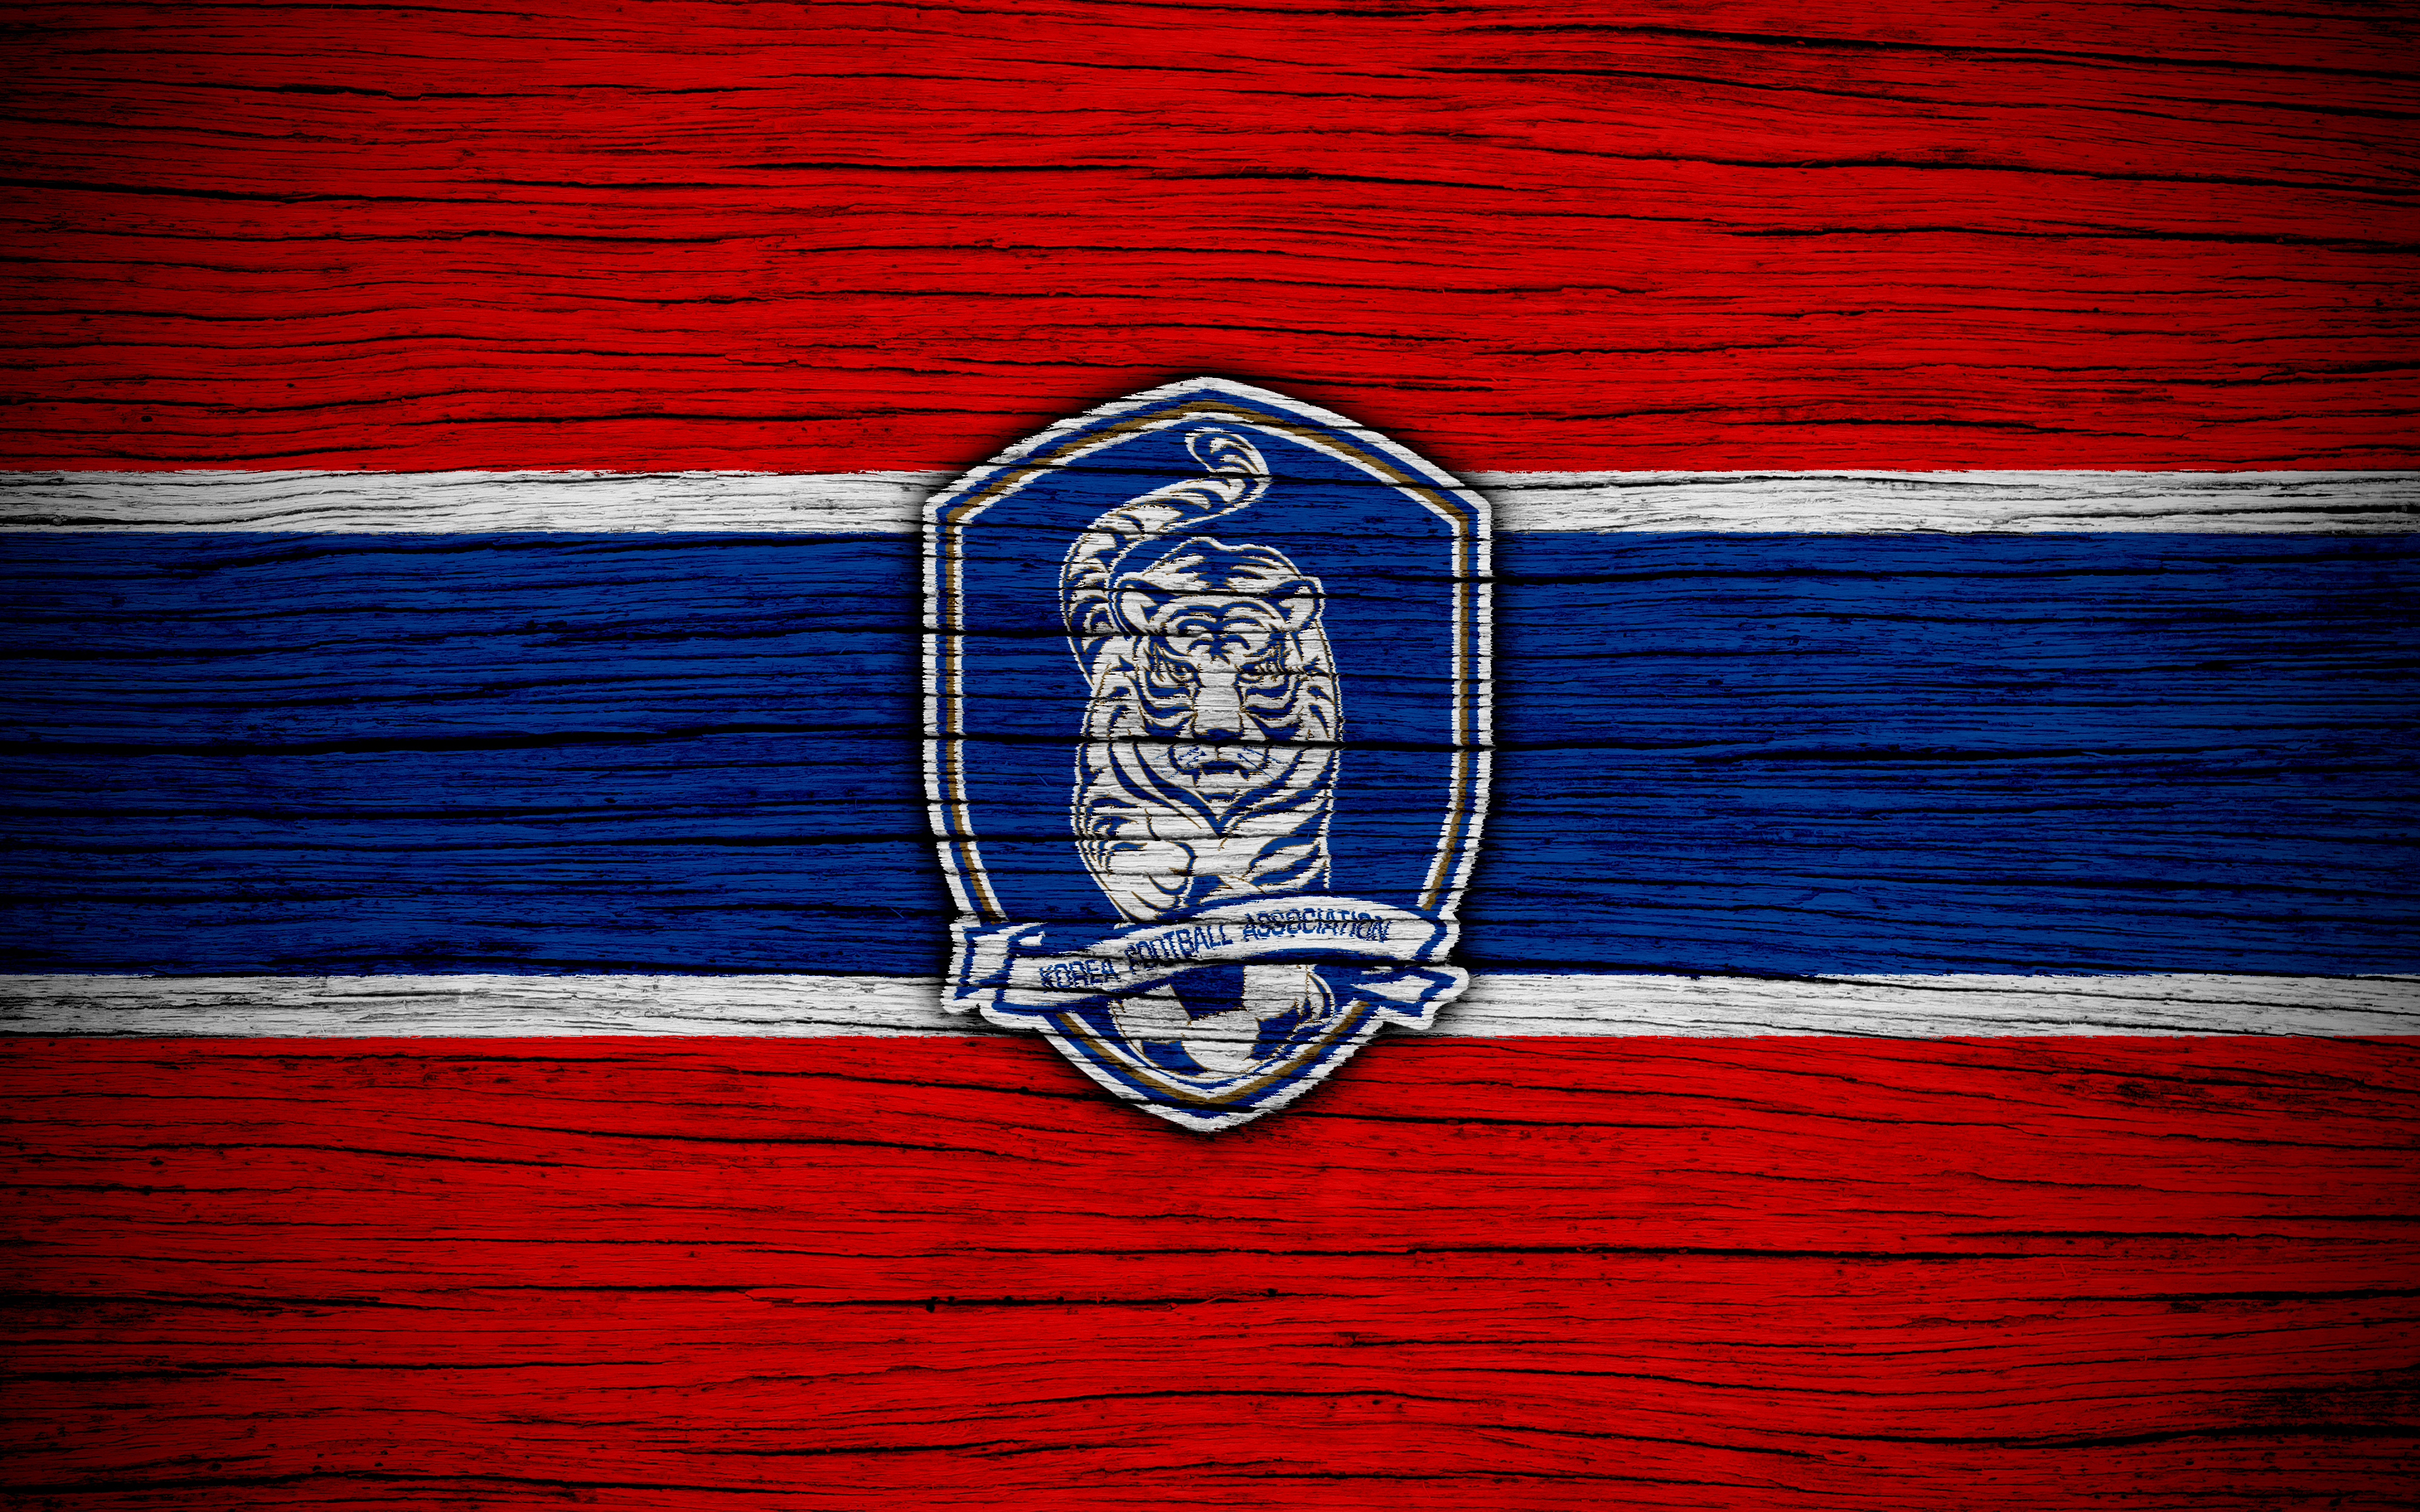 South Korea National Football Background 10